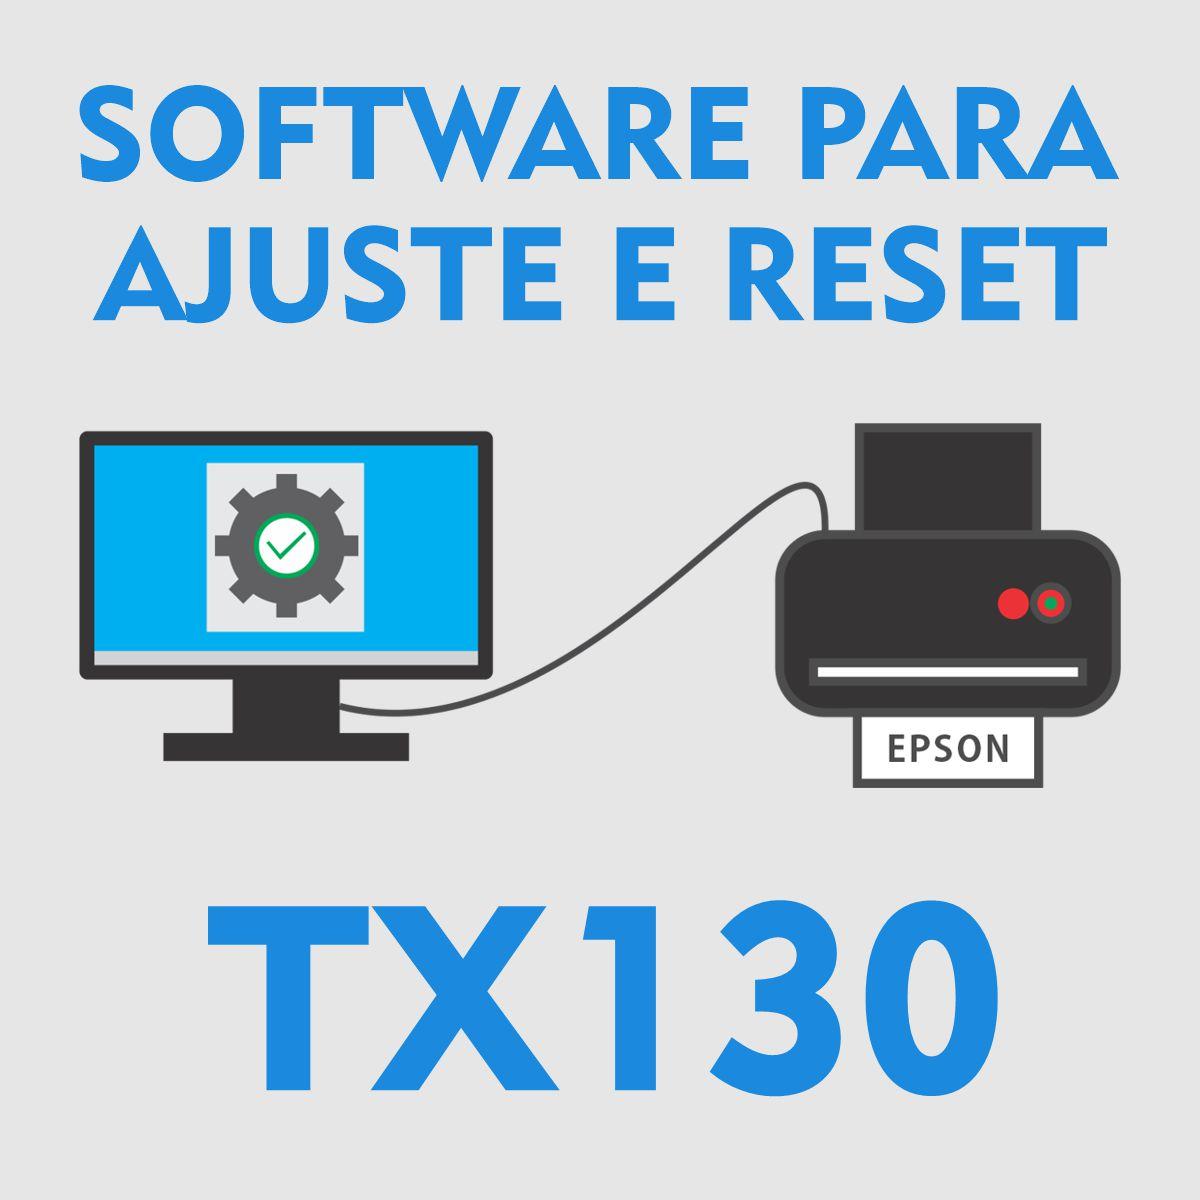 EPSON TX130 | SOFTWARE PARA AJUSTES E RESET DAS ALMOFADAS